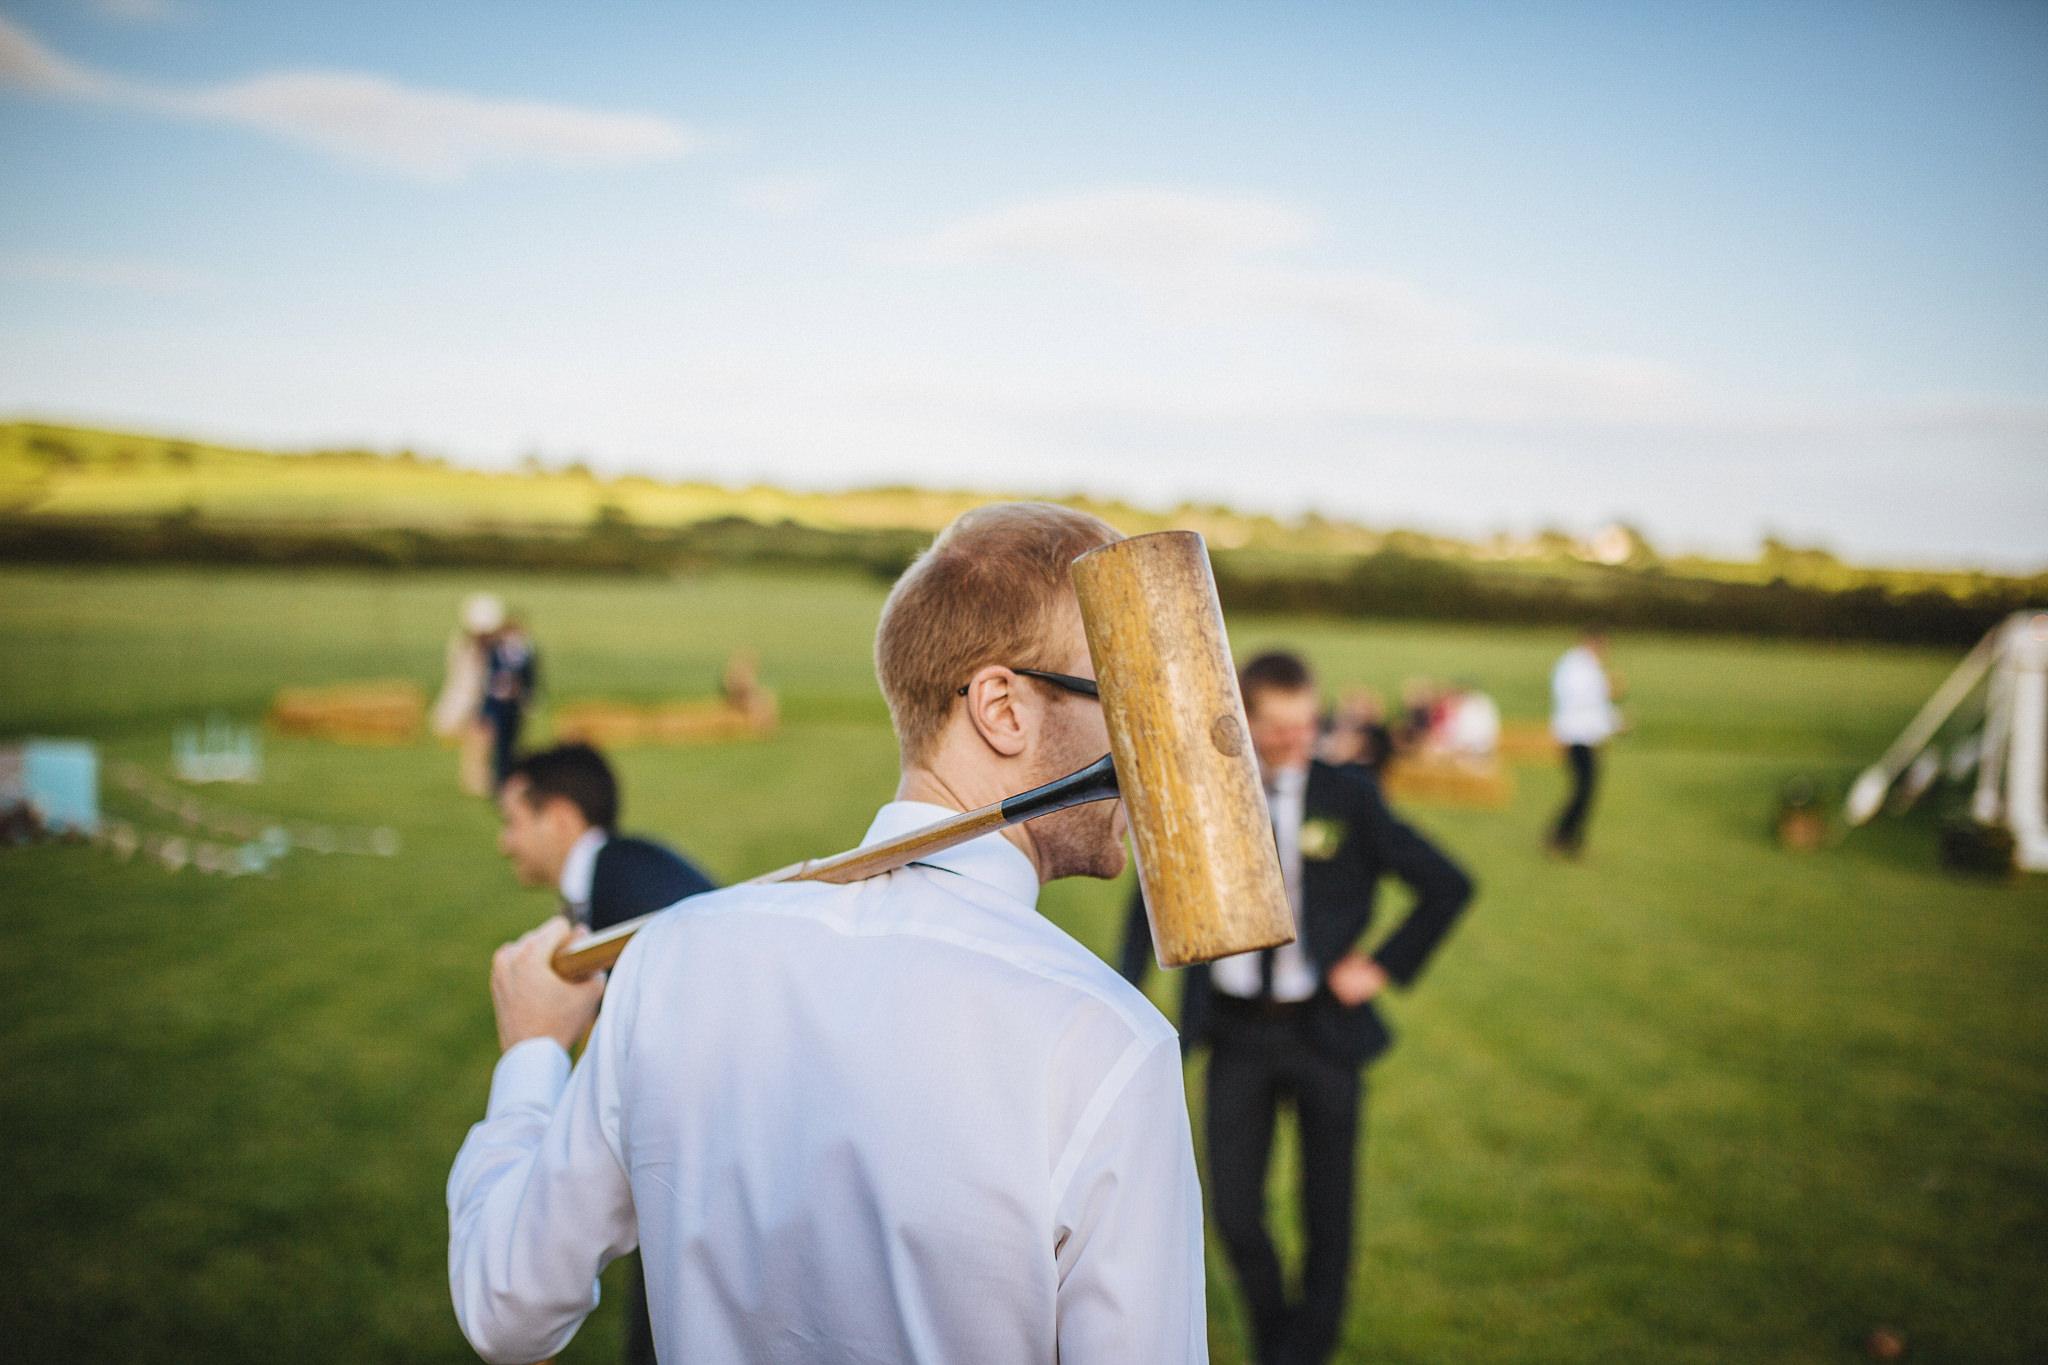 paul-marbrook-Farm-Wedding-Photographer-Lancashire-90076